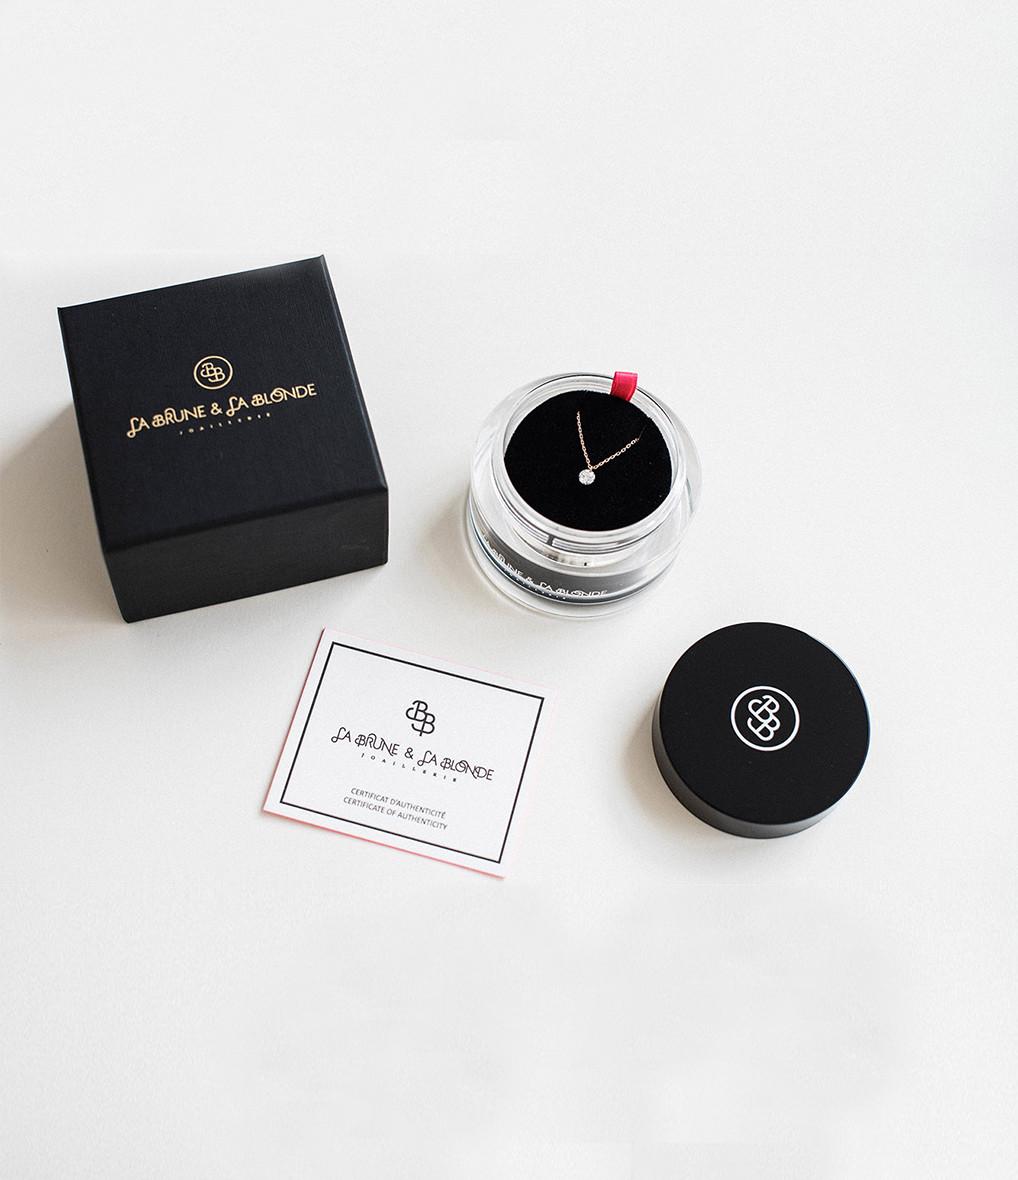 LA BRUNE & LA BLONDE - Collier Confetti Cœur Rubis Or Rose